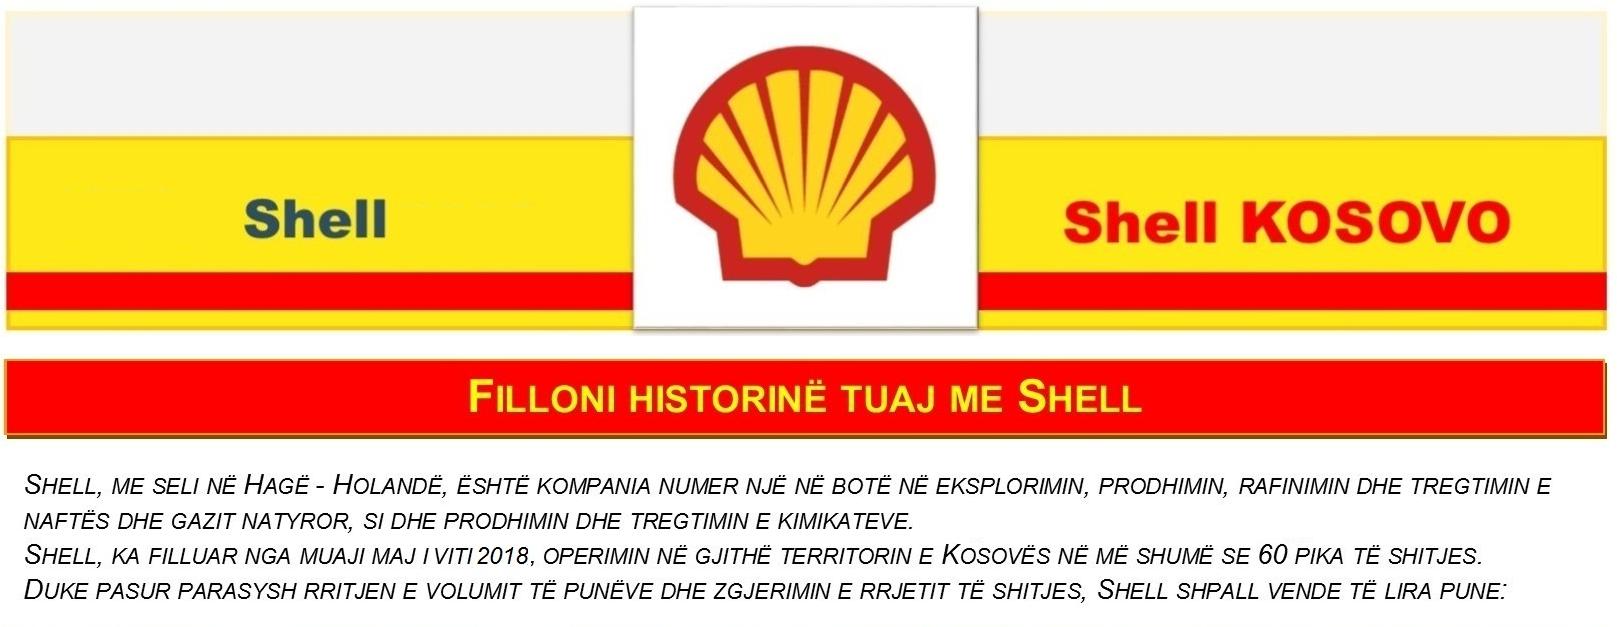 Shell Mirembajtes